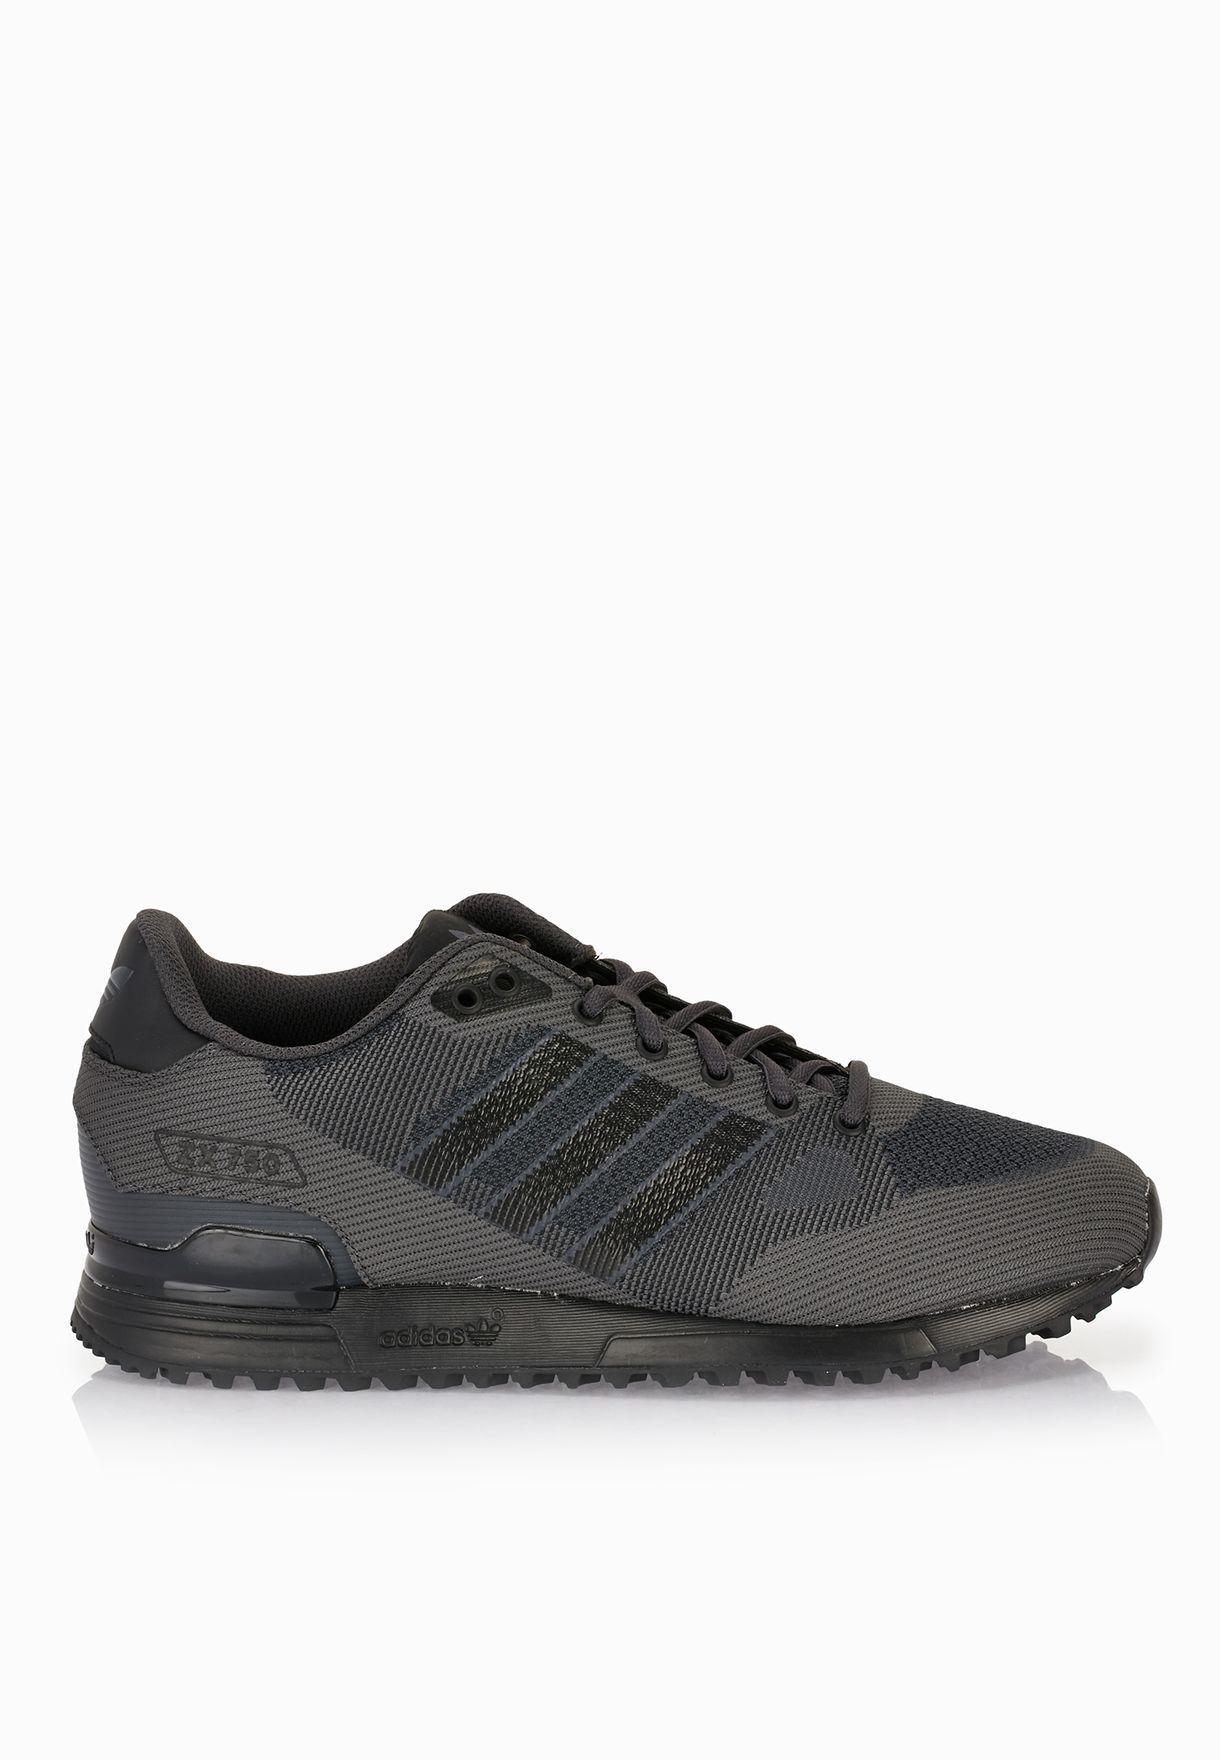 premium selection 22d7e 7c24e ... buy shop adidas originals multicolor zx 750 wv s80125 for men in saudi  ad478sh30ykz 12d6f 91a12